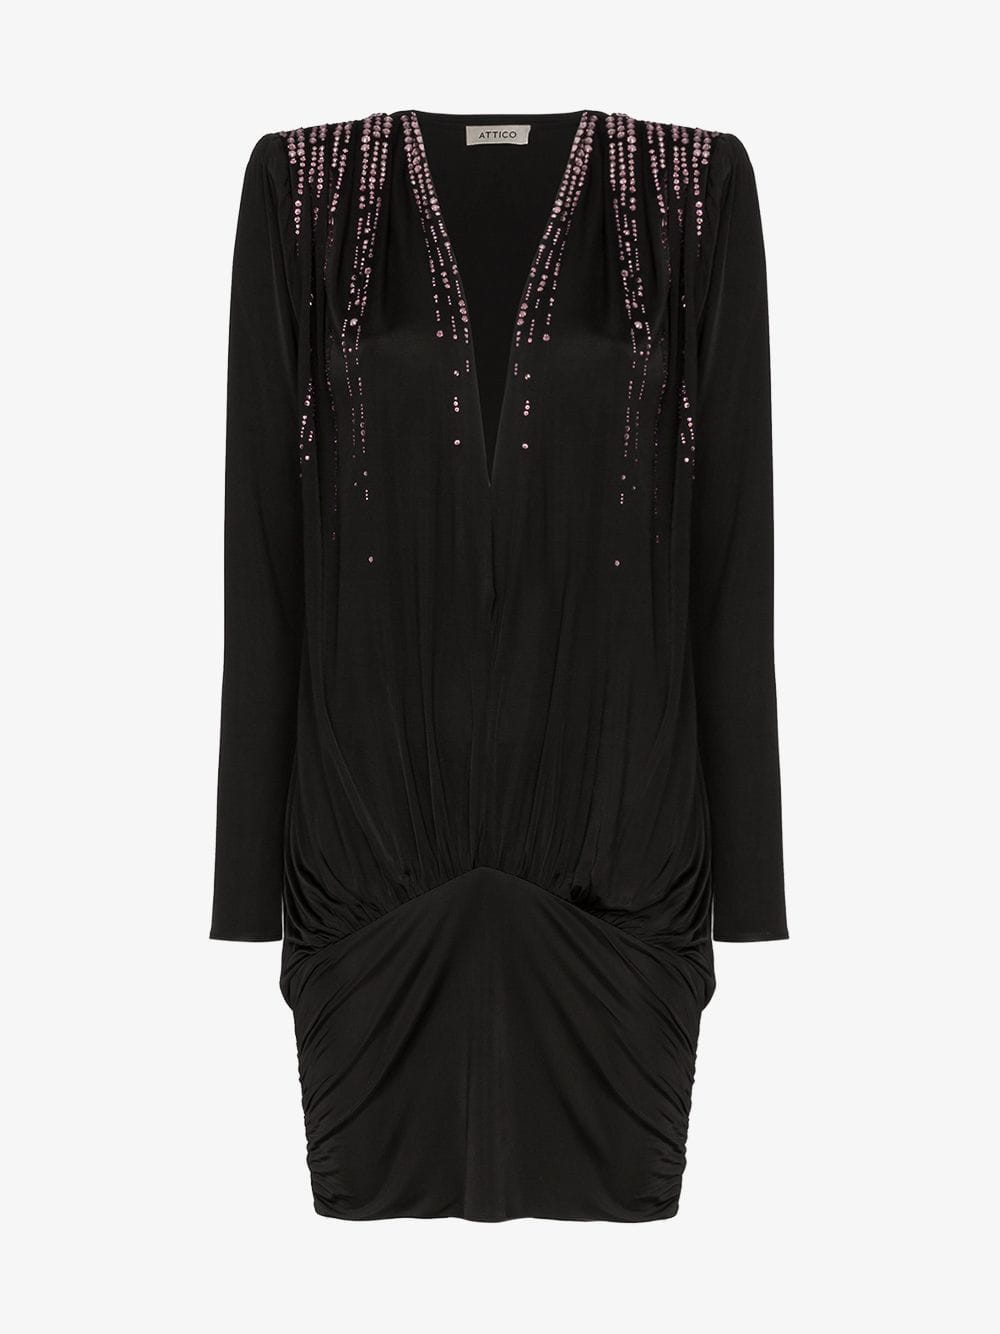 Attico V-neck crystal embellished mini dress in black